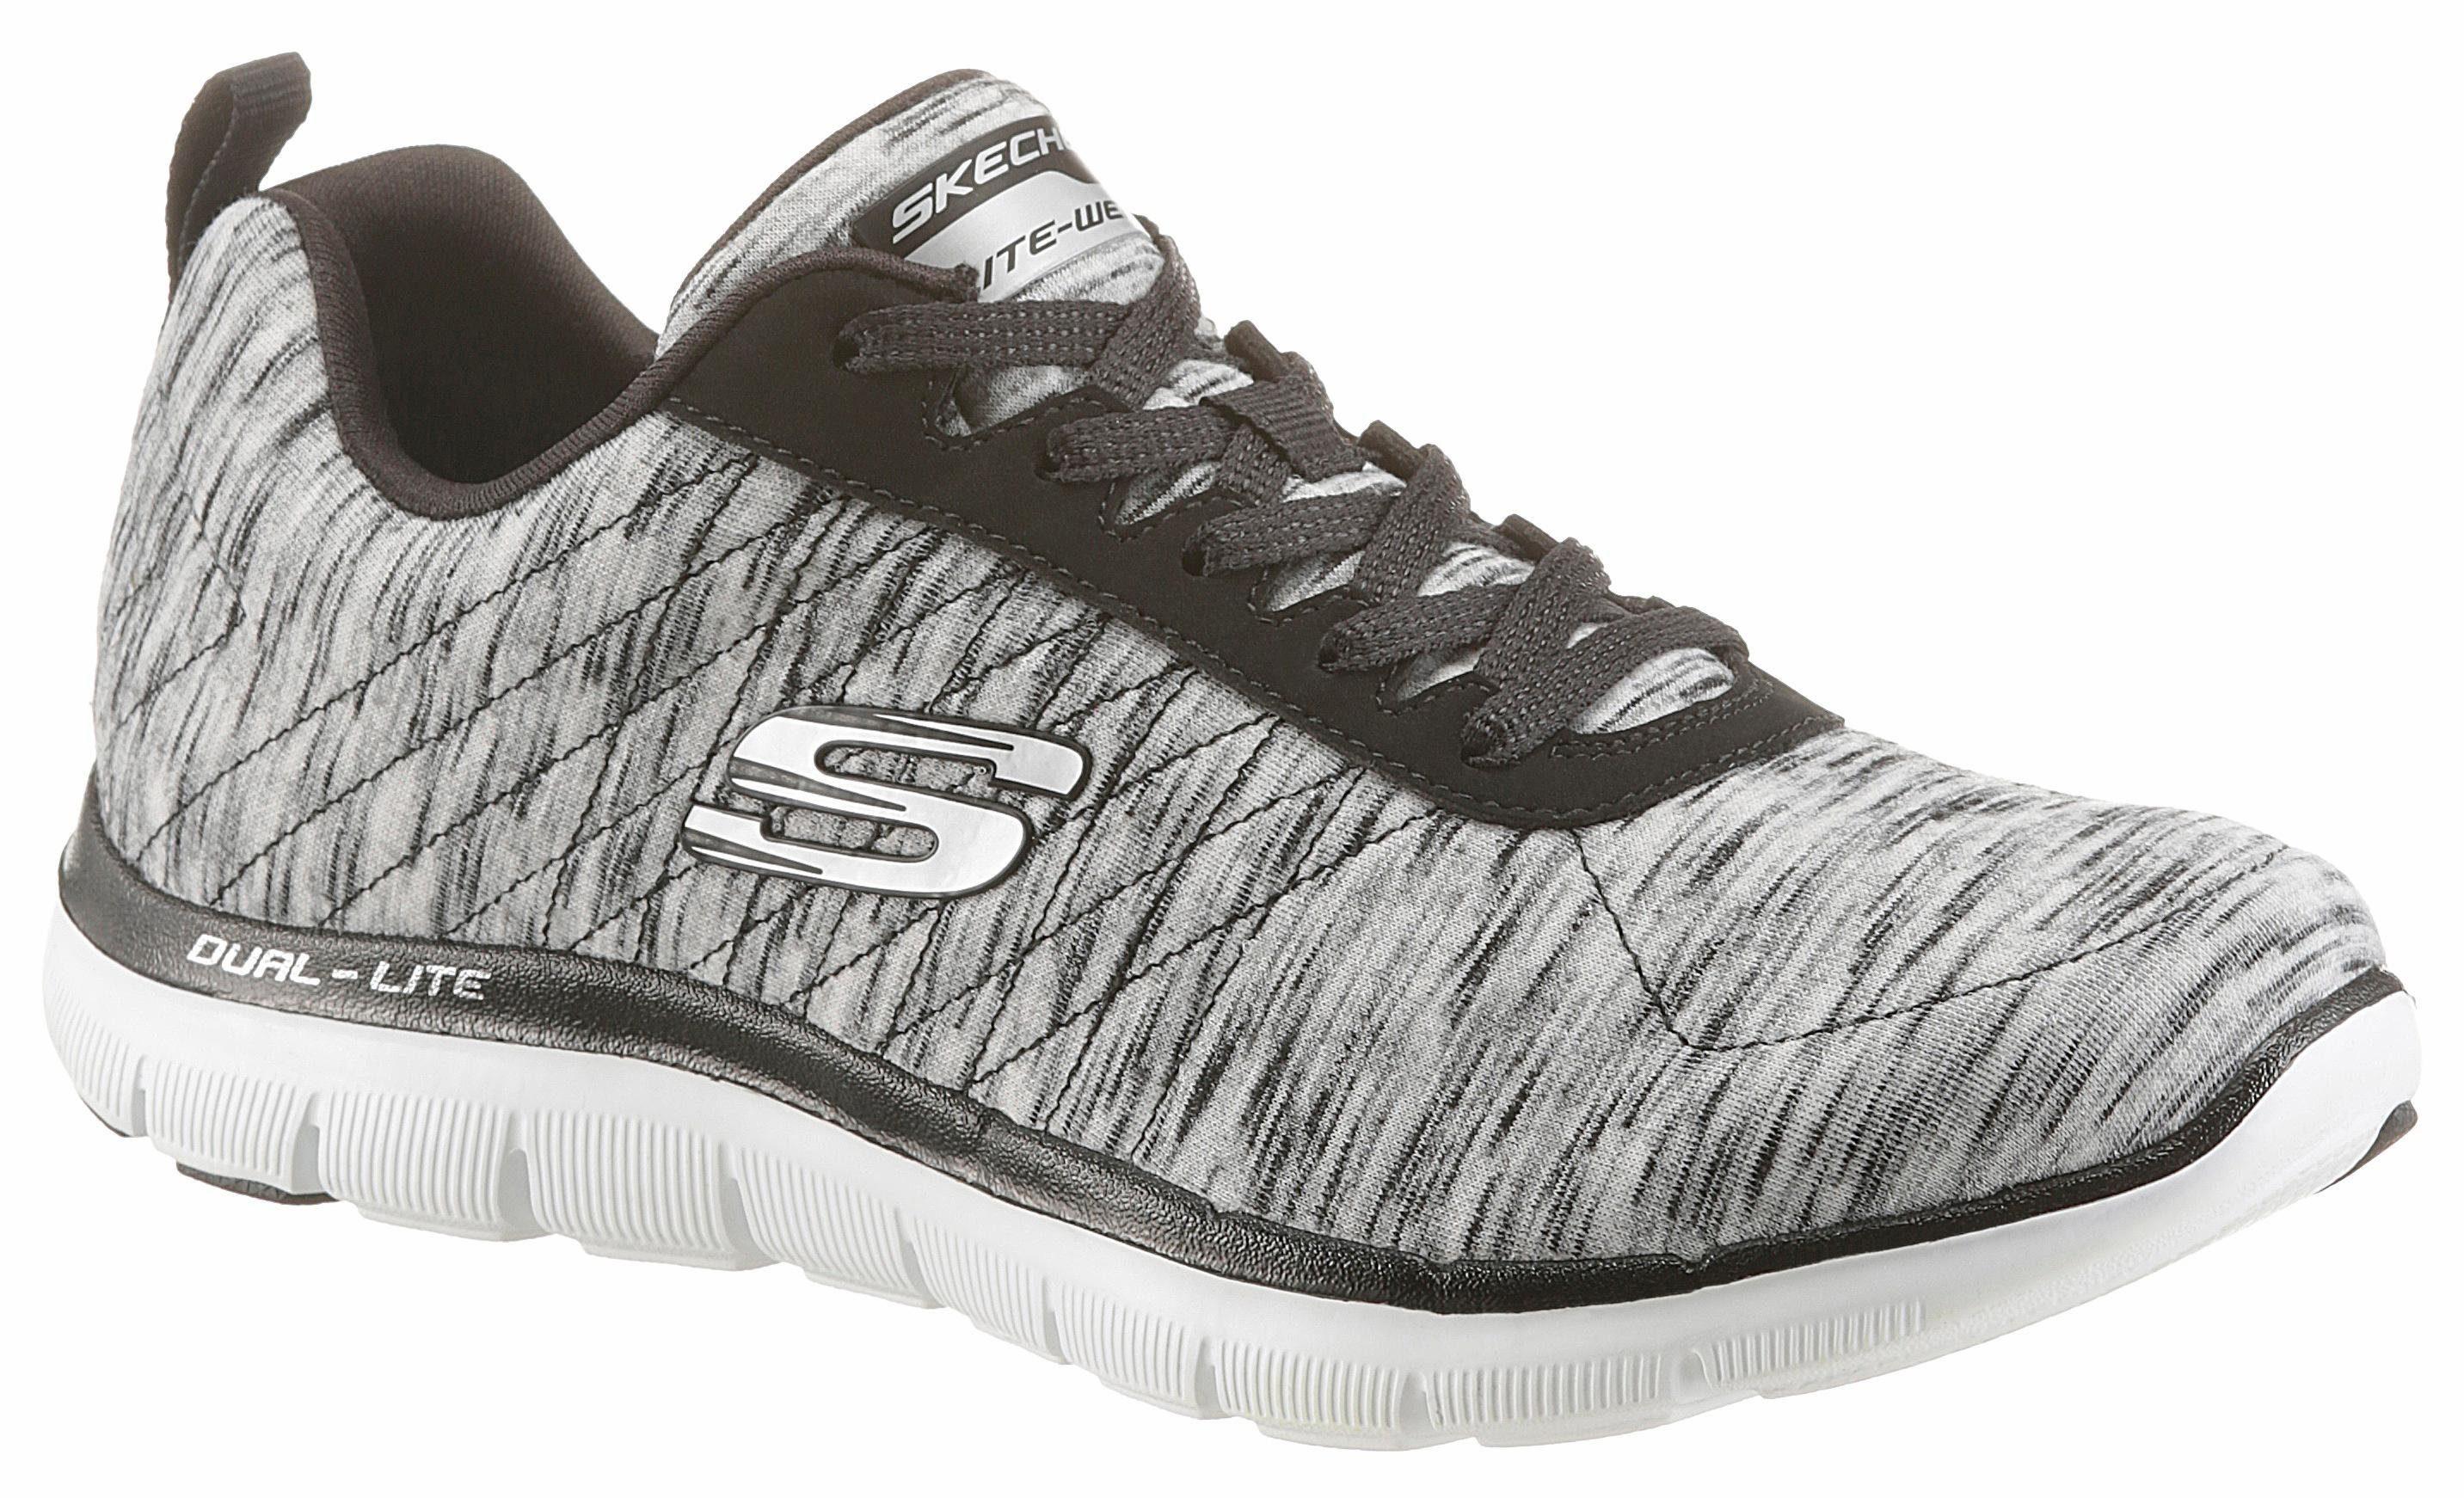 Skechers »Flex Appeal 2.0« Sneaker, mit Air Cooled Memory Foam, grau, grau-mint